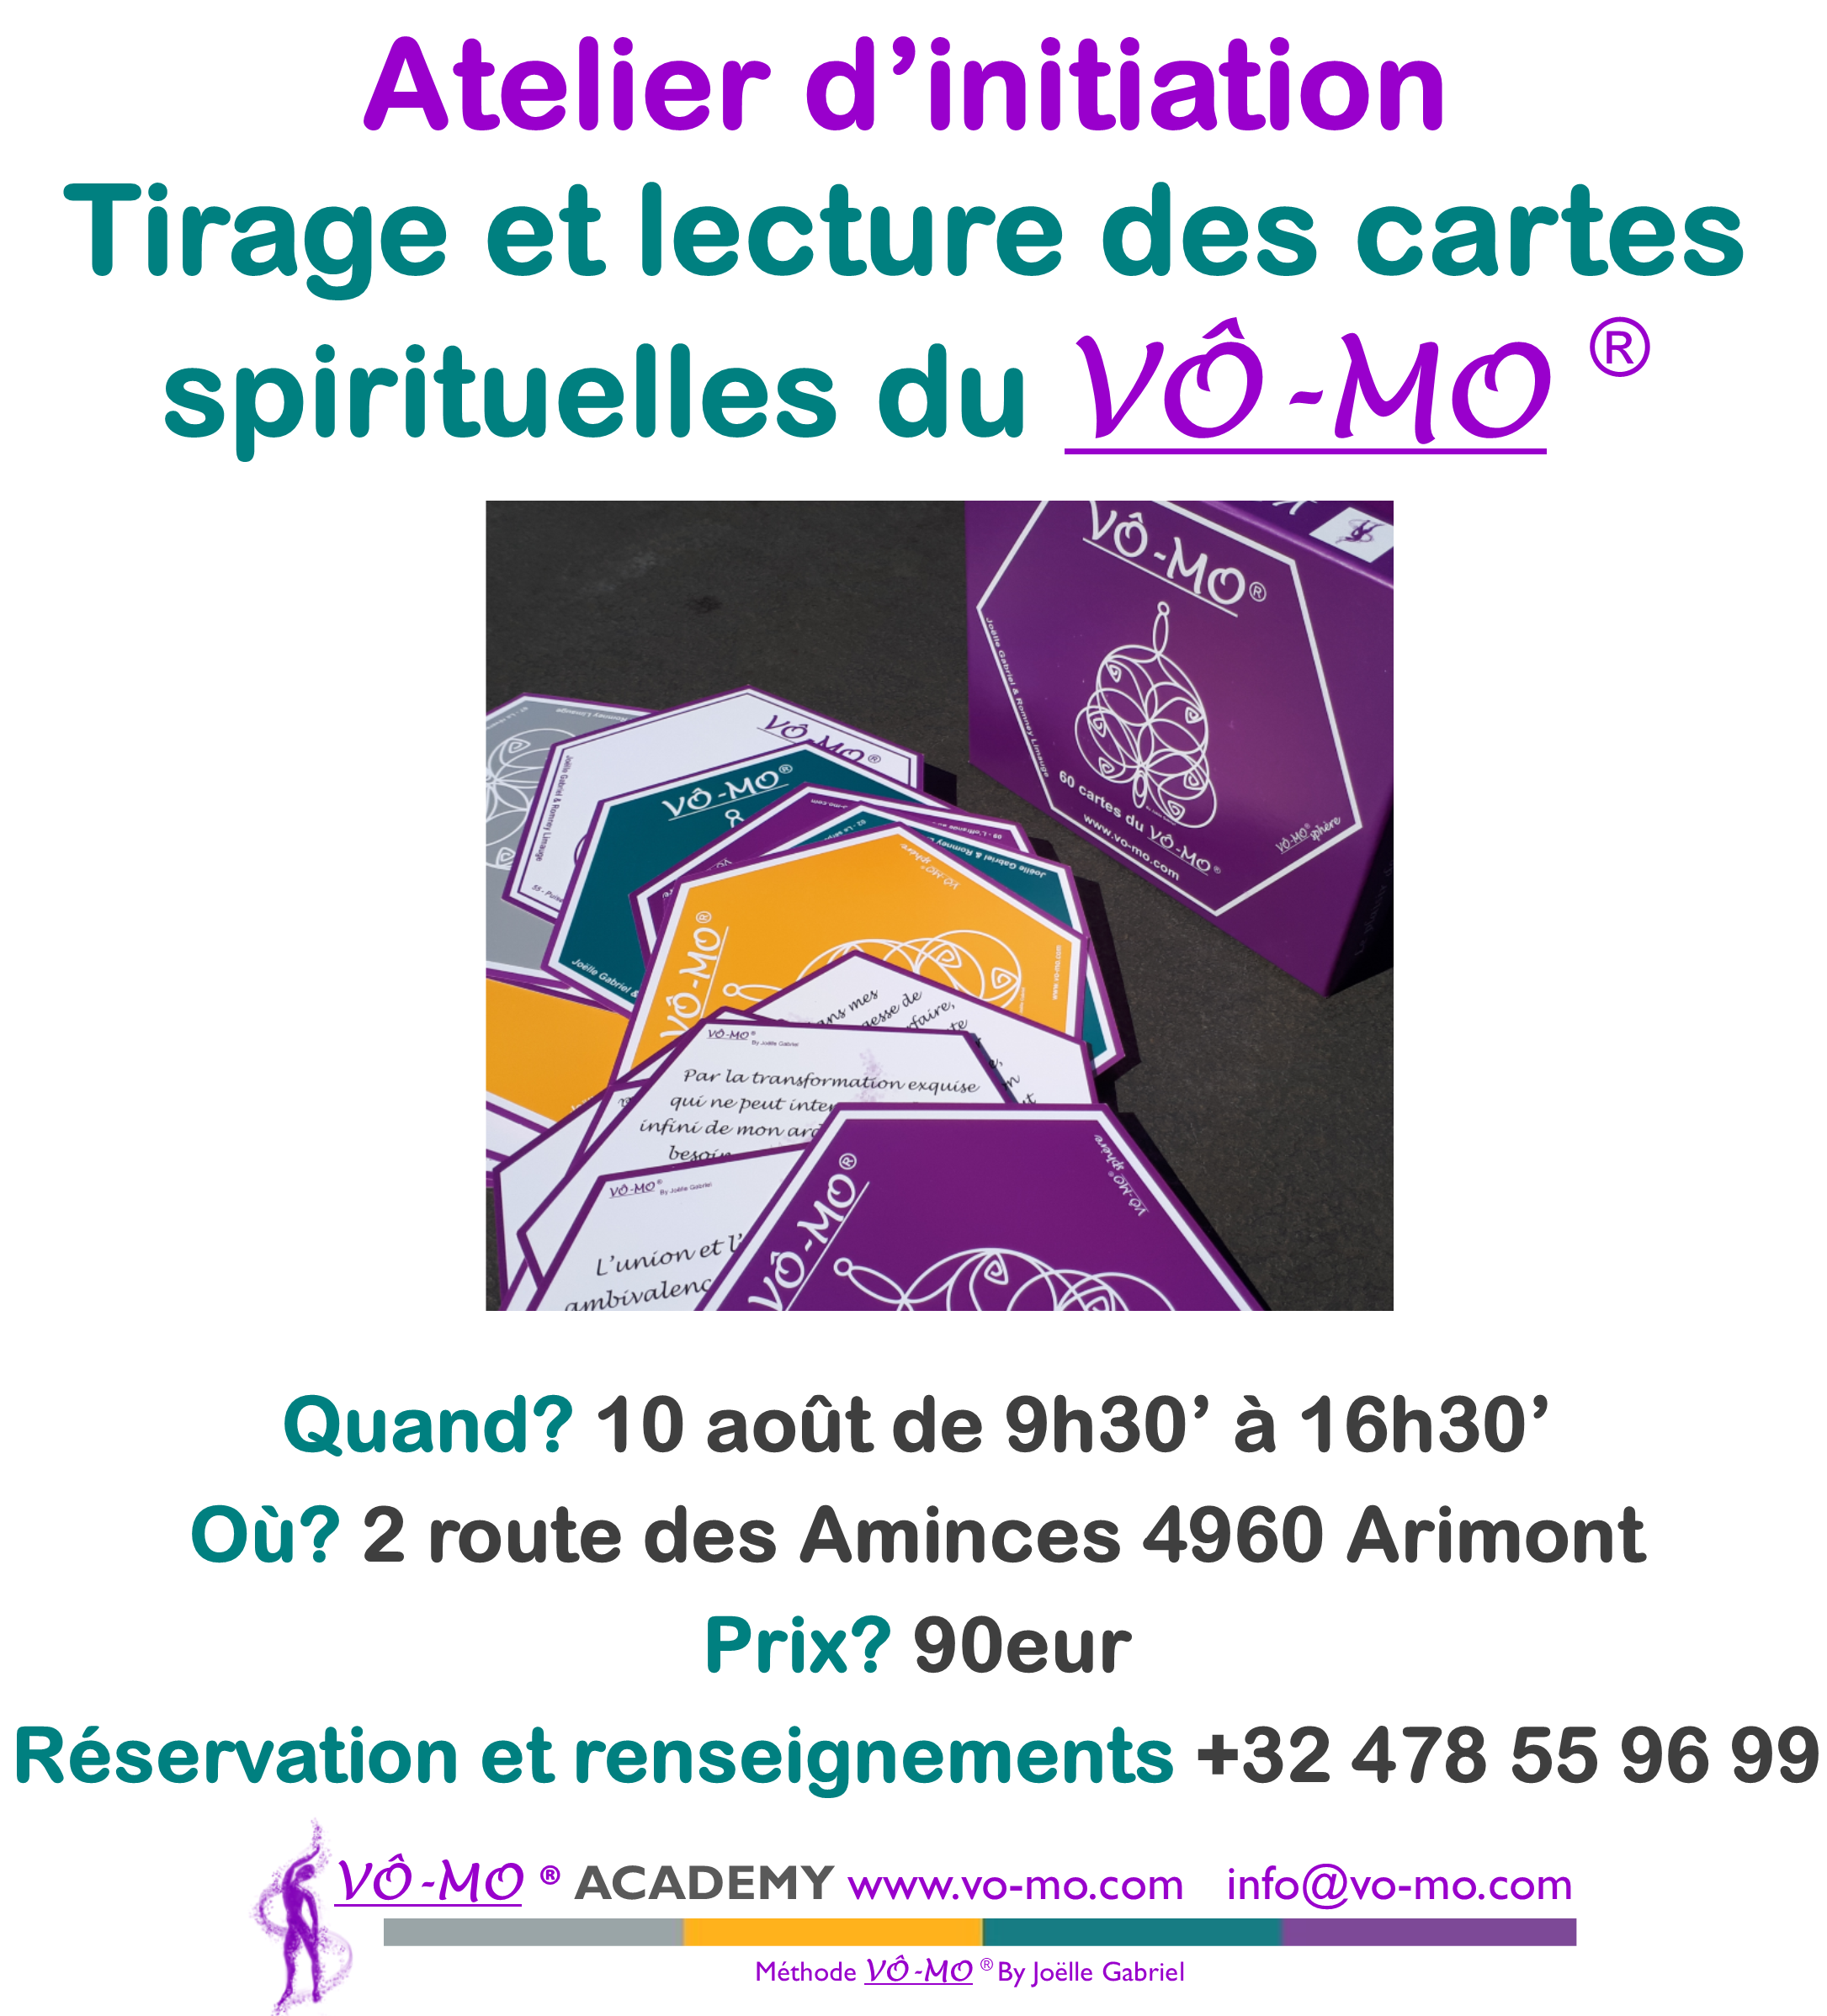 Atelier cartes spirituelles du VÔ-MO @ VÔ-MO Academy